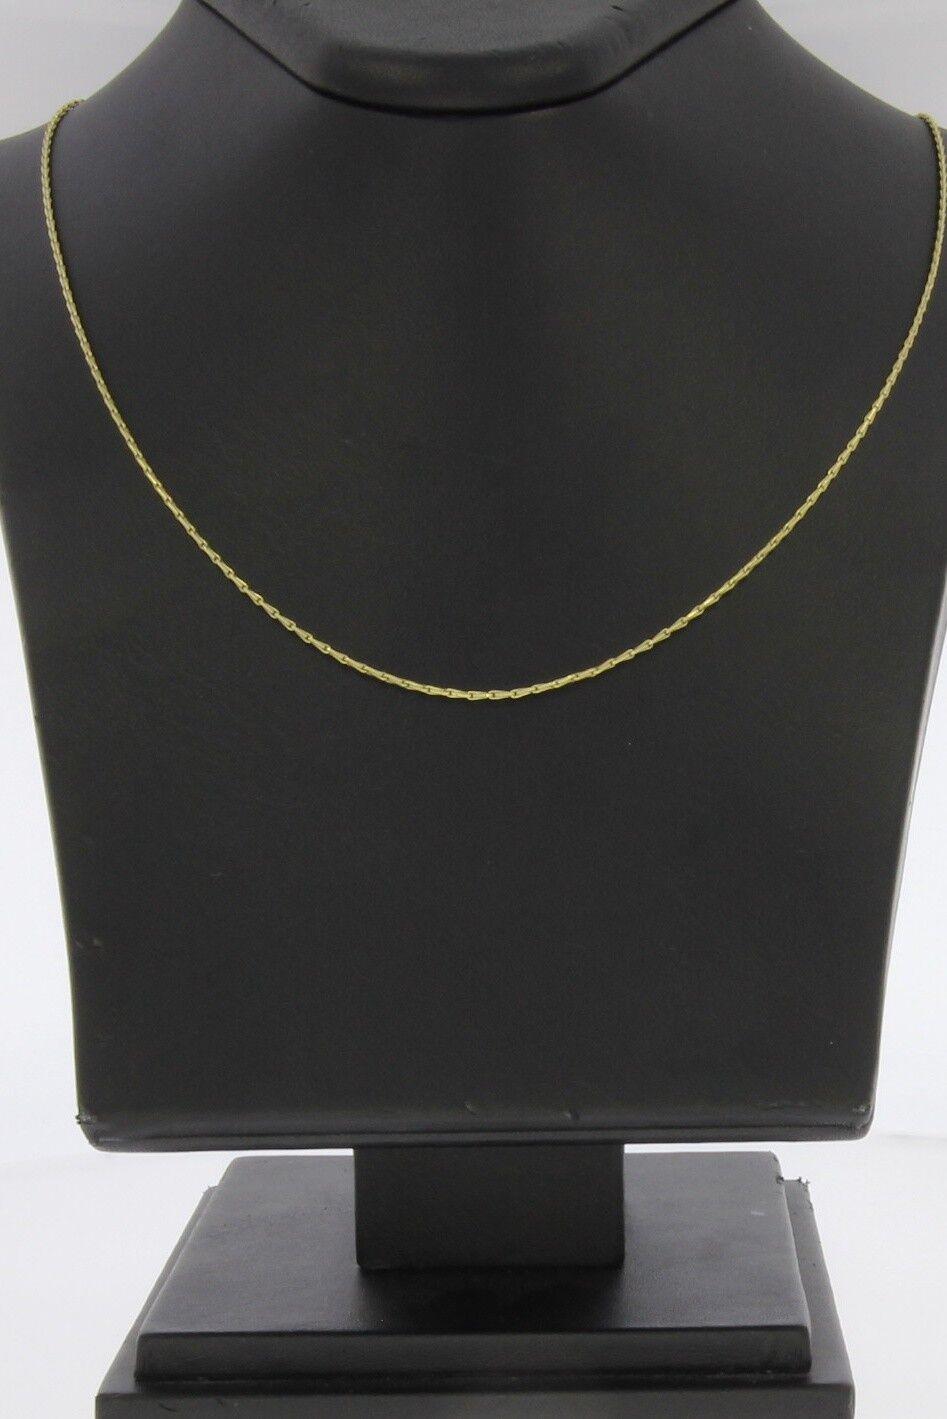 9047-333er yellowgoldkette Lang 55 cm Breit 0,6 mm Gewicht 2,3 Gramm